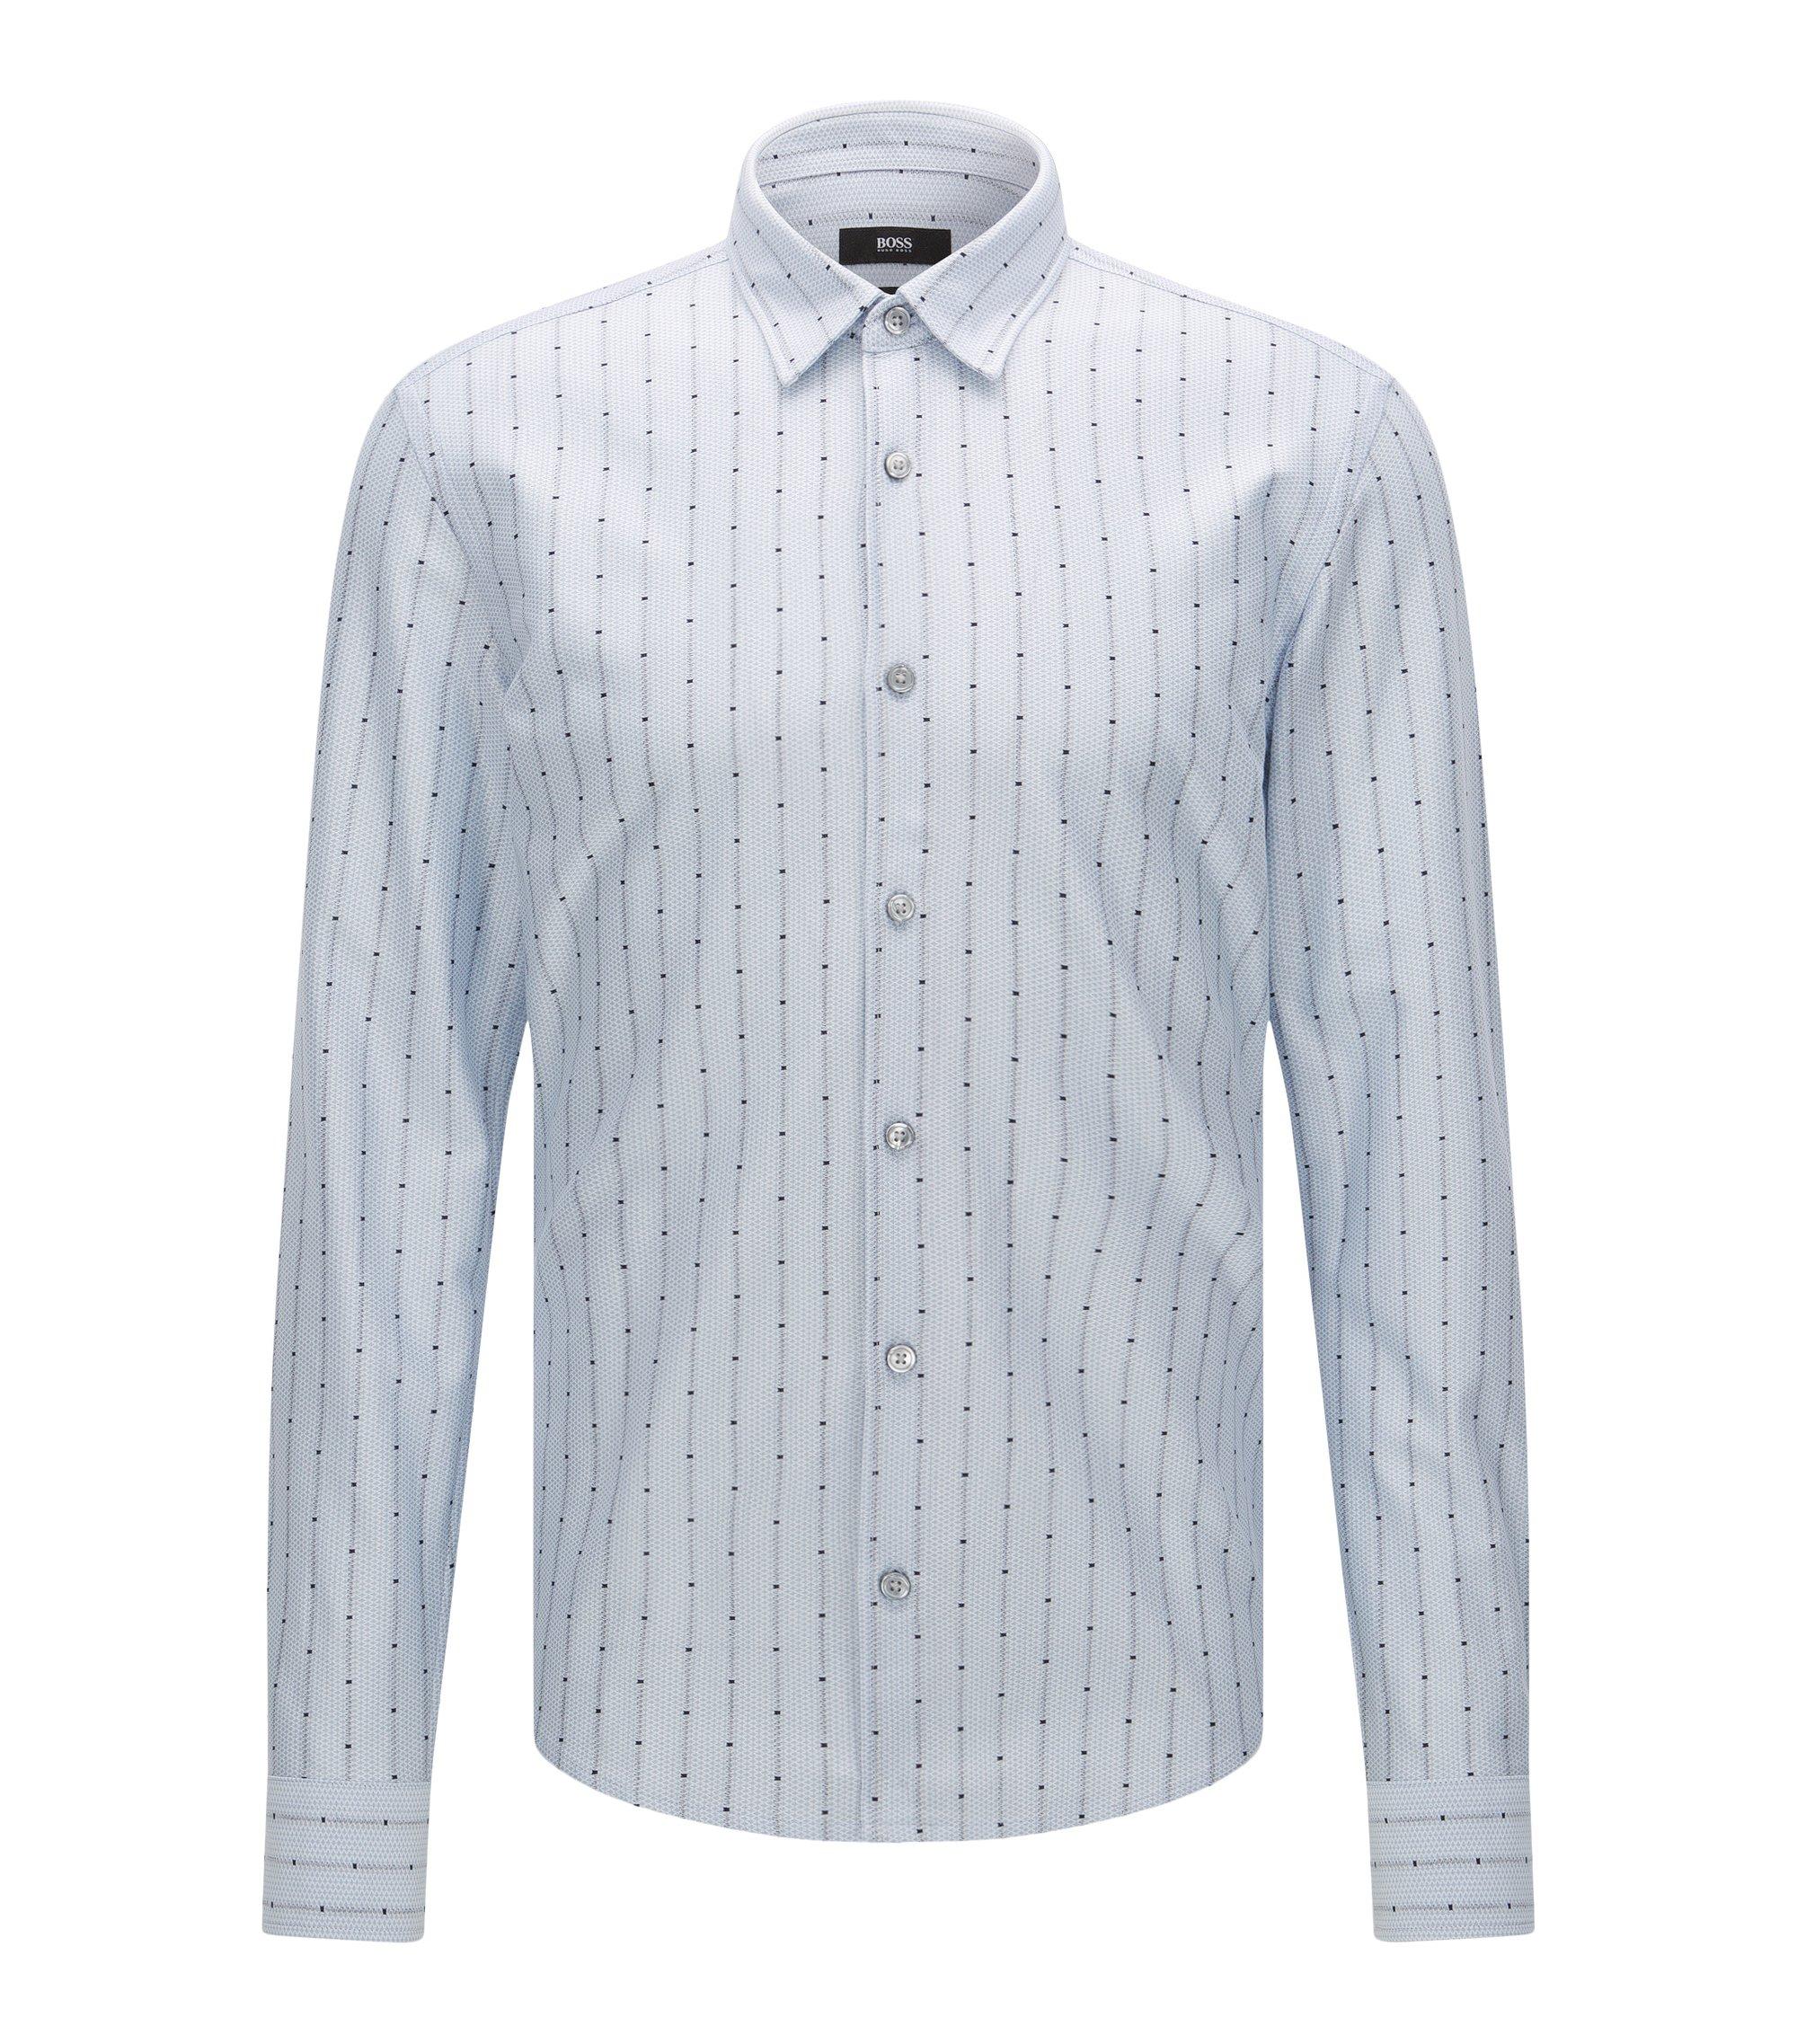 'Reid F' | Slim Fit, Cotton Jersey Button Down Shirt, Light Blue